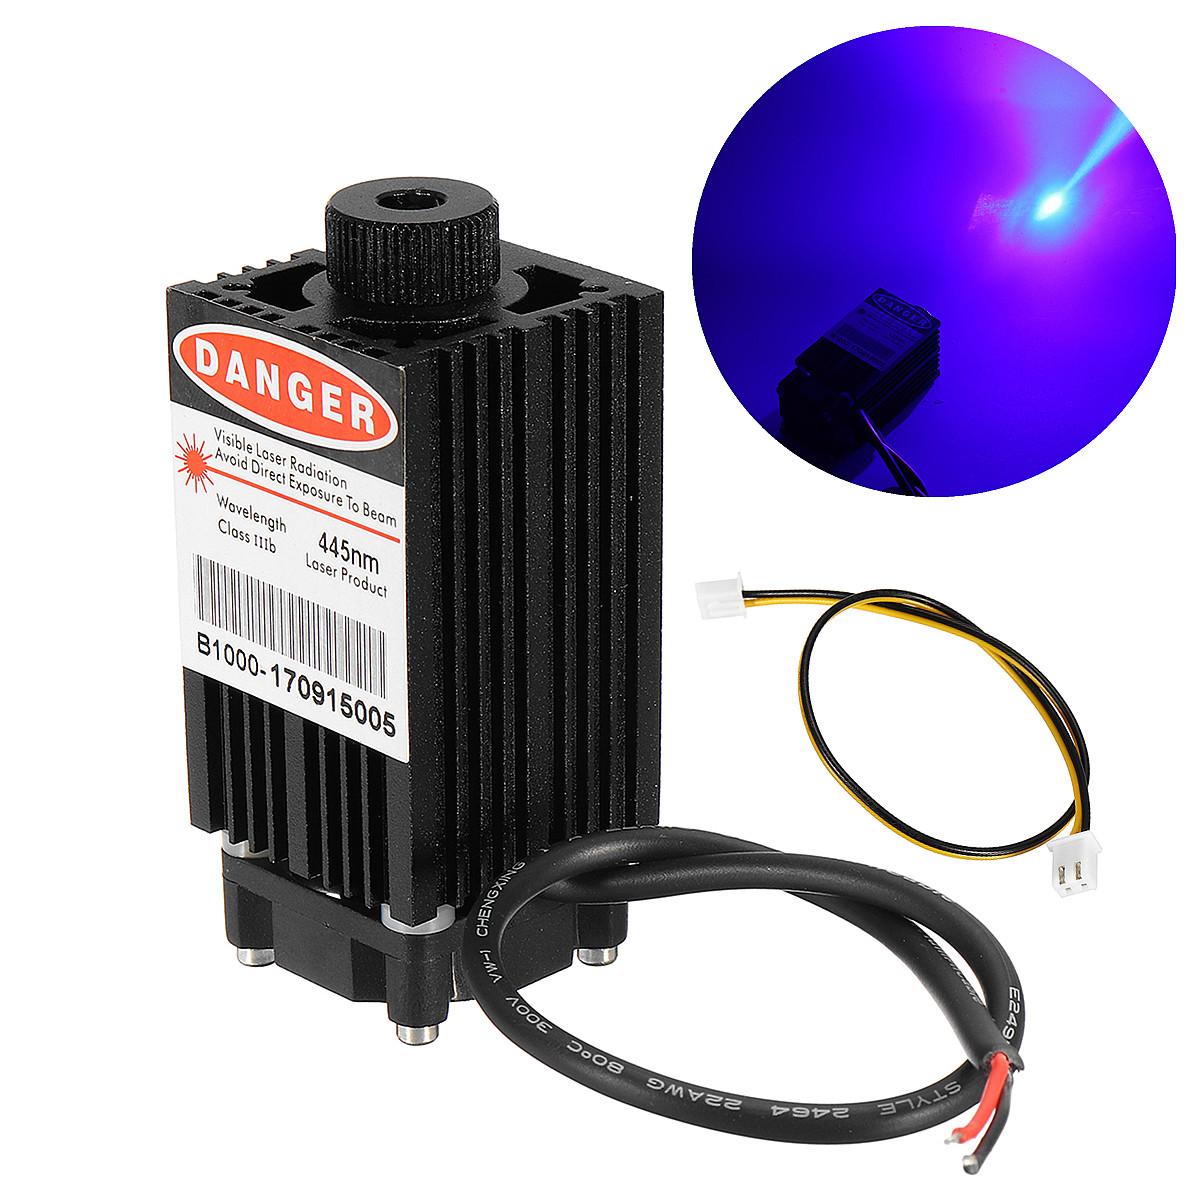 1000mW 445nm Focusable Blue Laser Module for DIY Laser Printer Engraving Machine Engraver